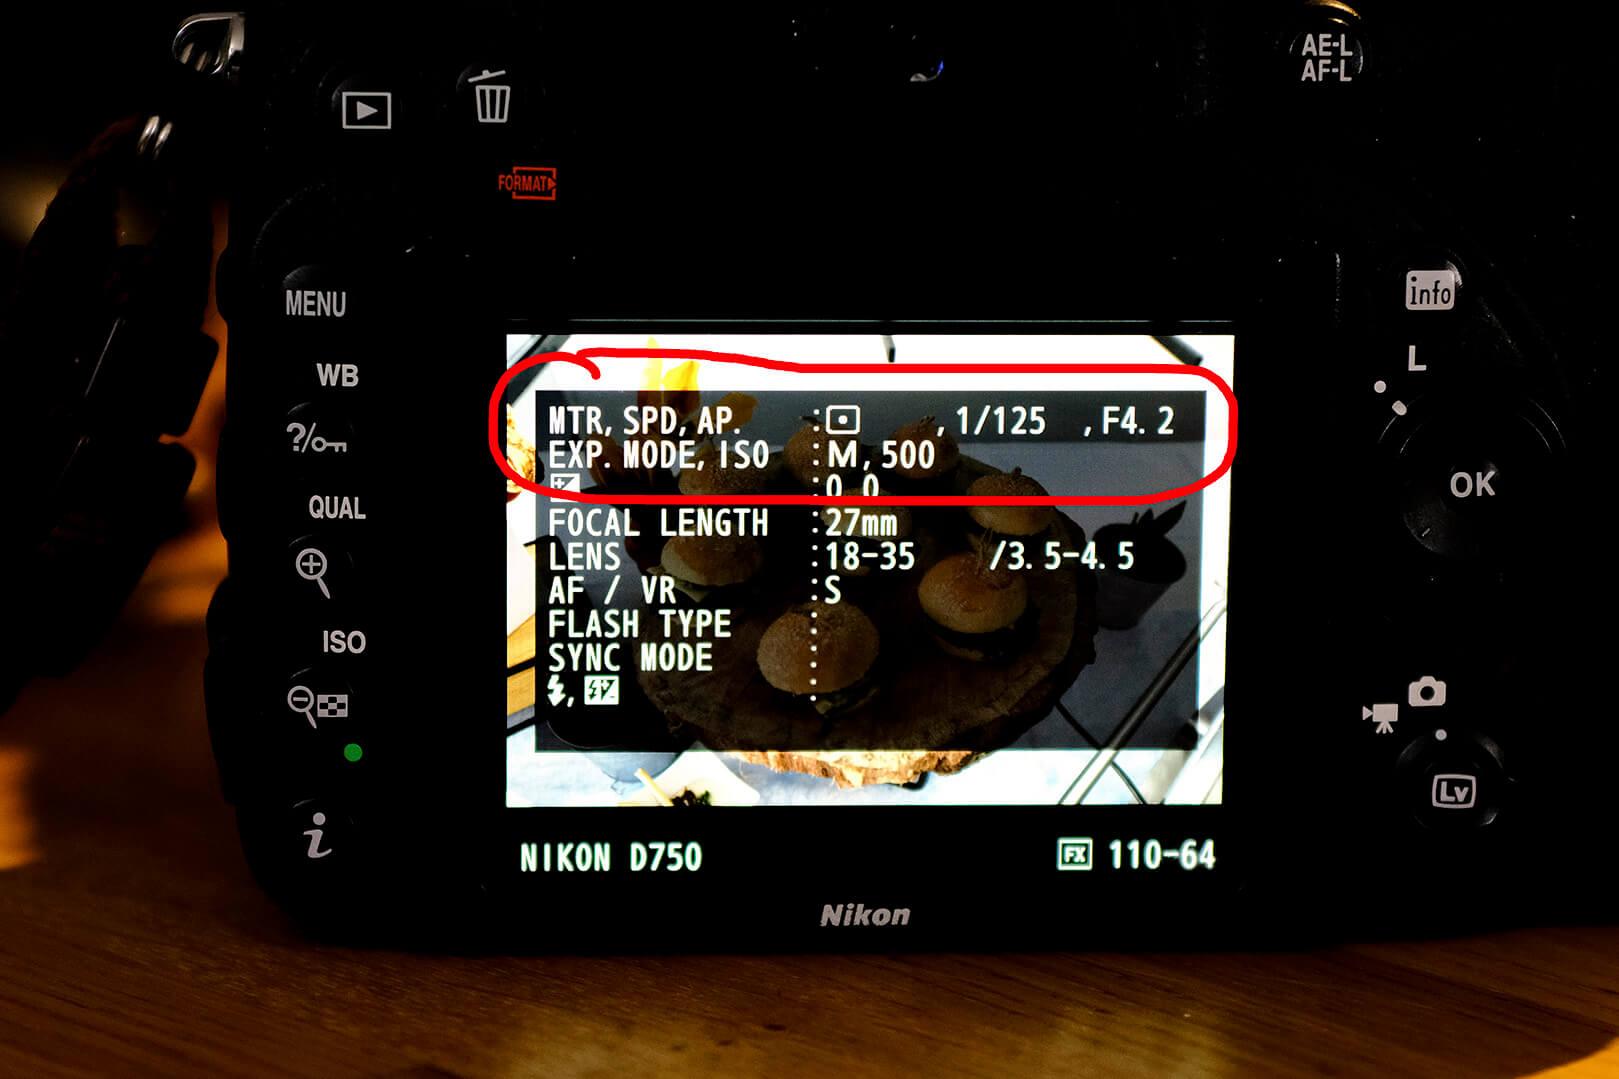 Kamera Display OlKe-Art Fotografie, Display Nikon D750